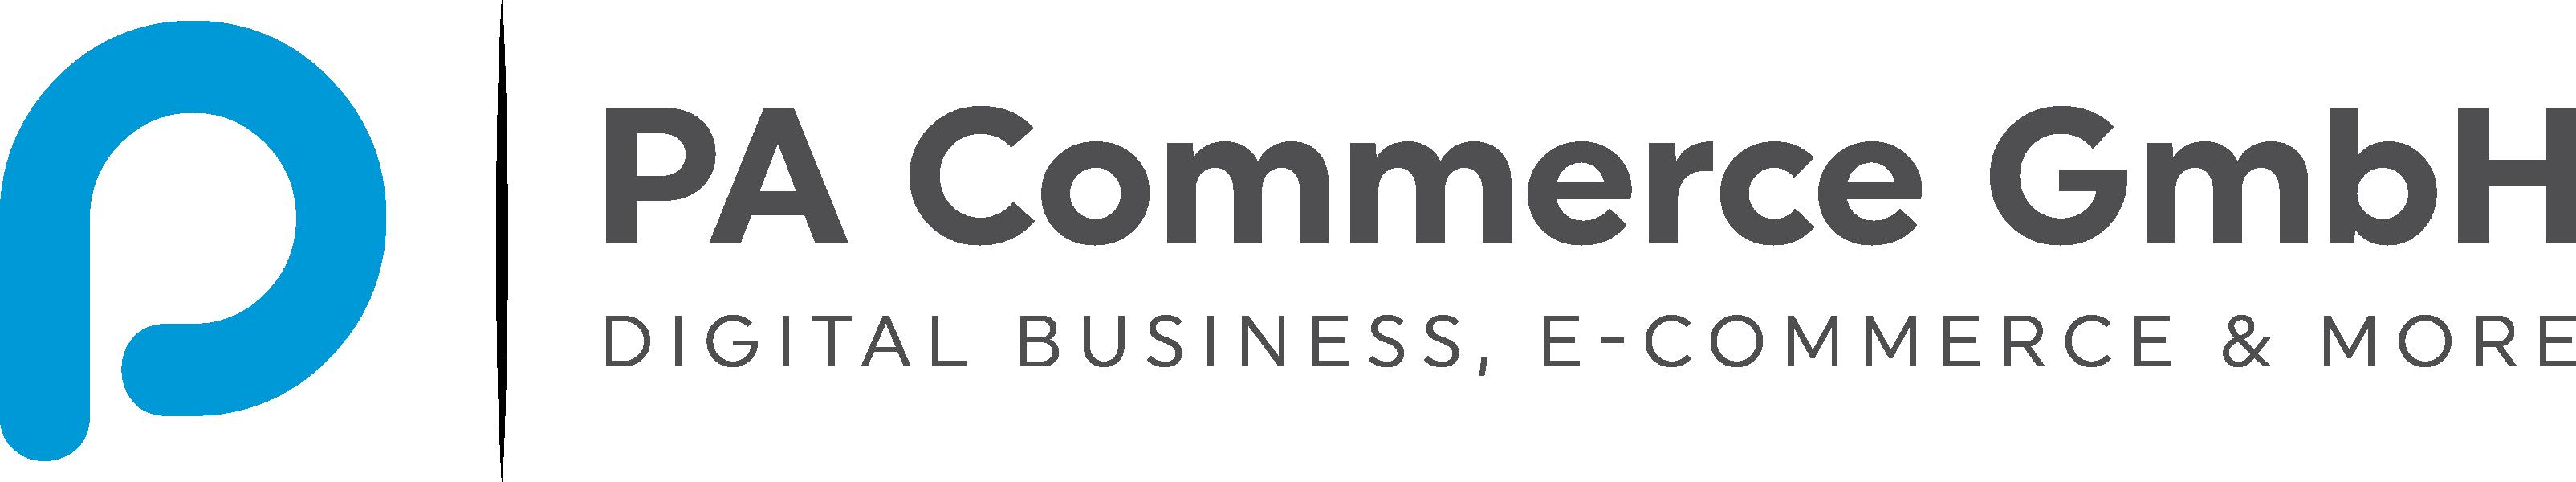 PA Commerce GmbH